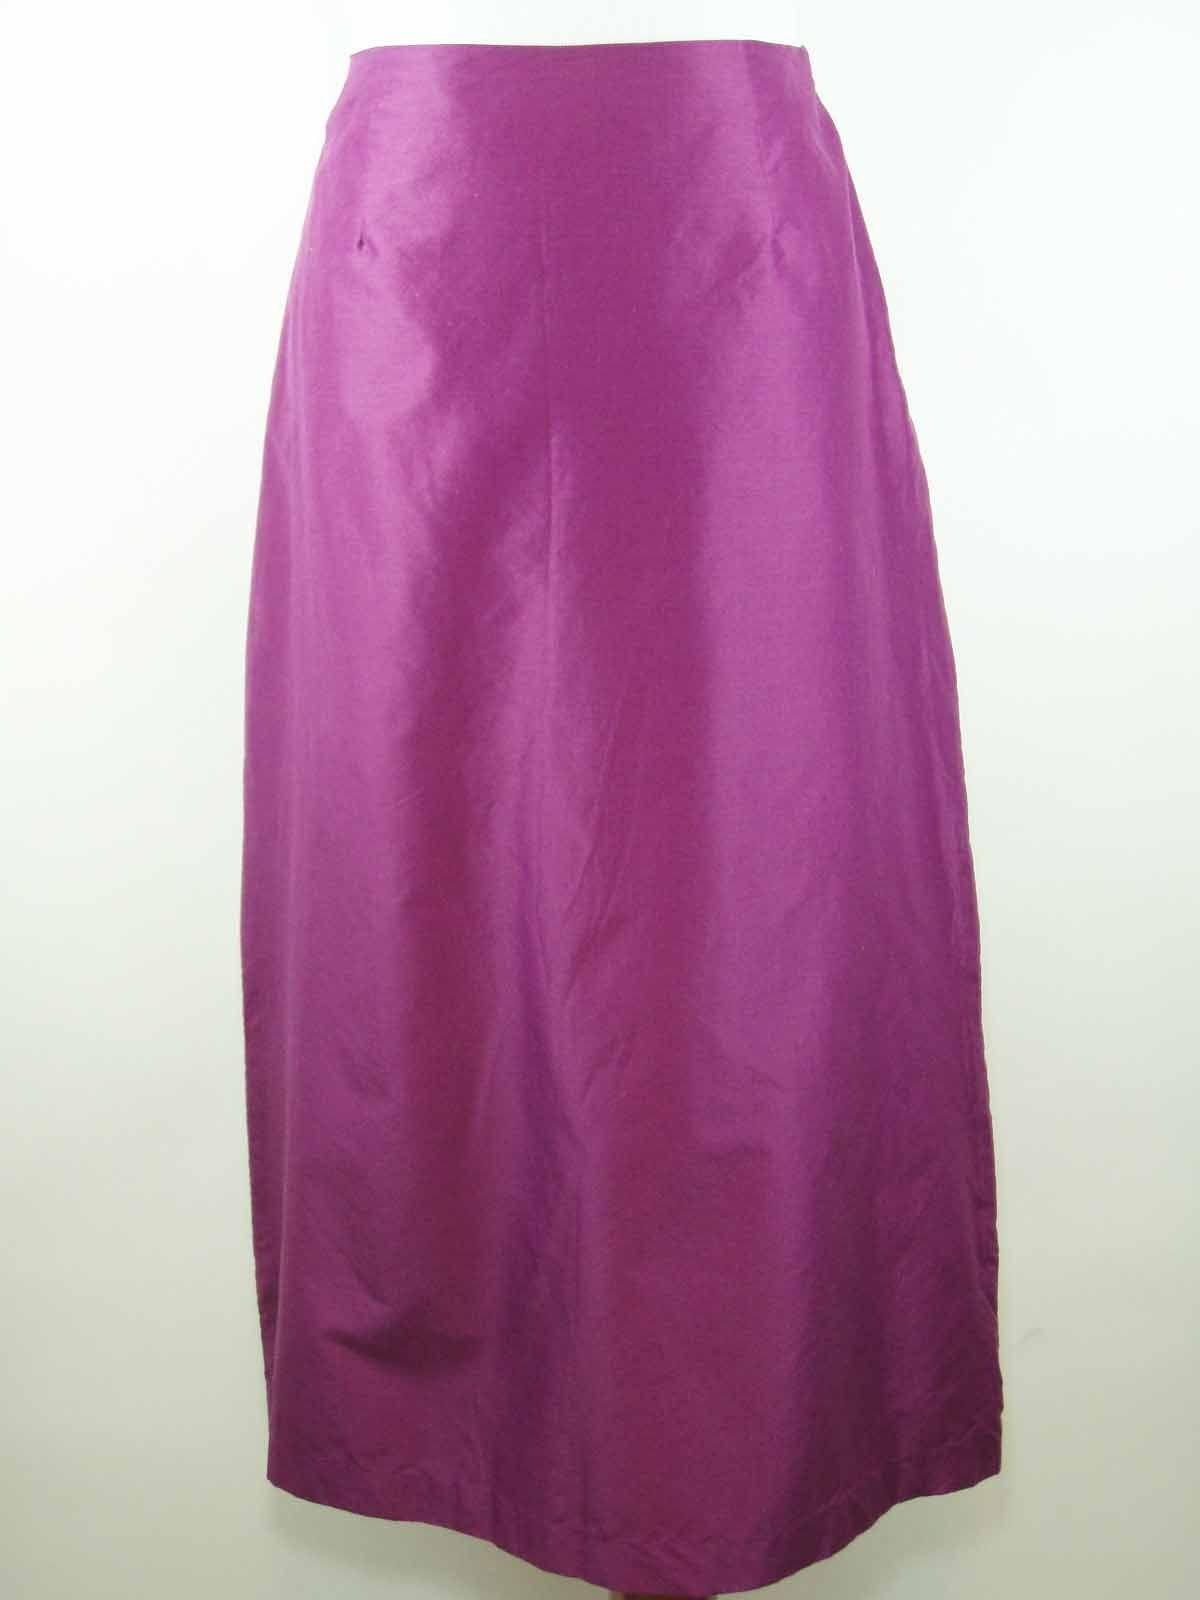 Ann Taylor Purple Long A Line Skirt - Cotton Blend Size 8 - NEW w  Tag